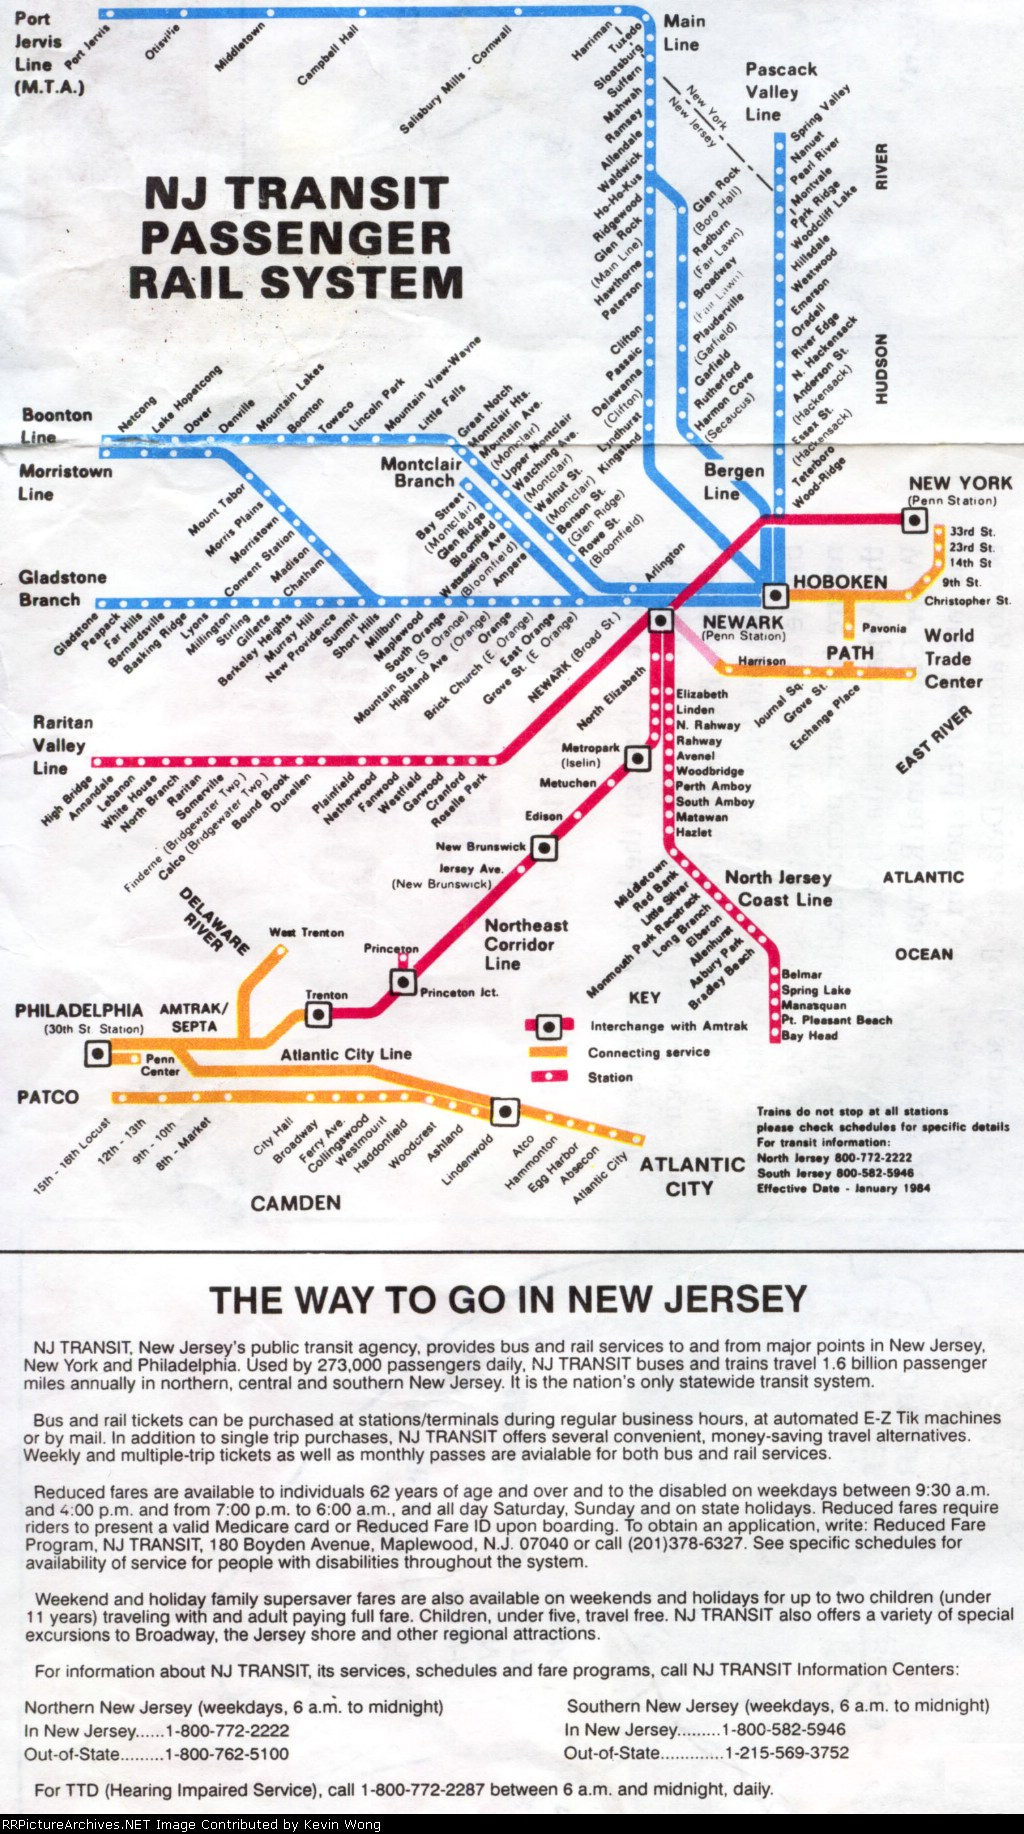 NJ Transit system map/guide, effective January 1984